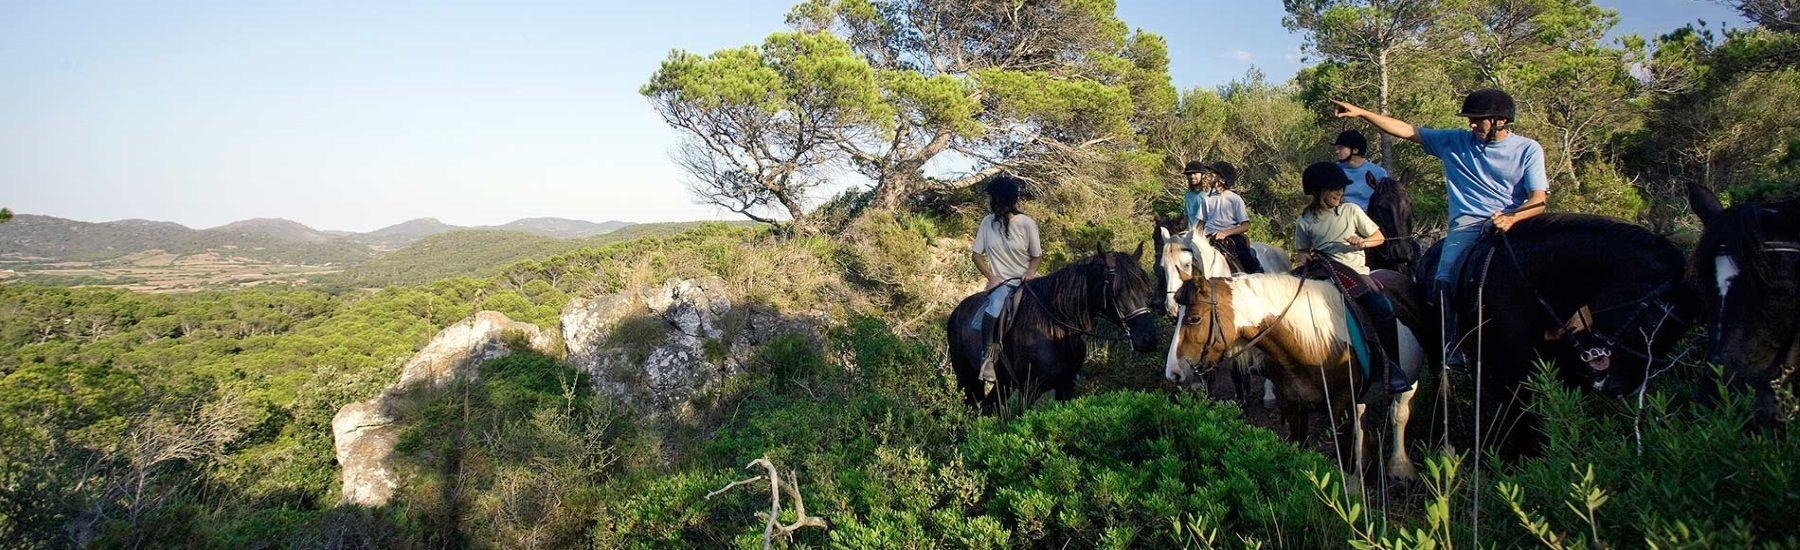 Pferde in Menorca reiten